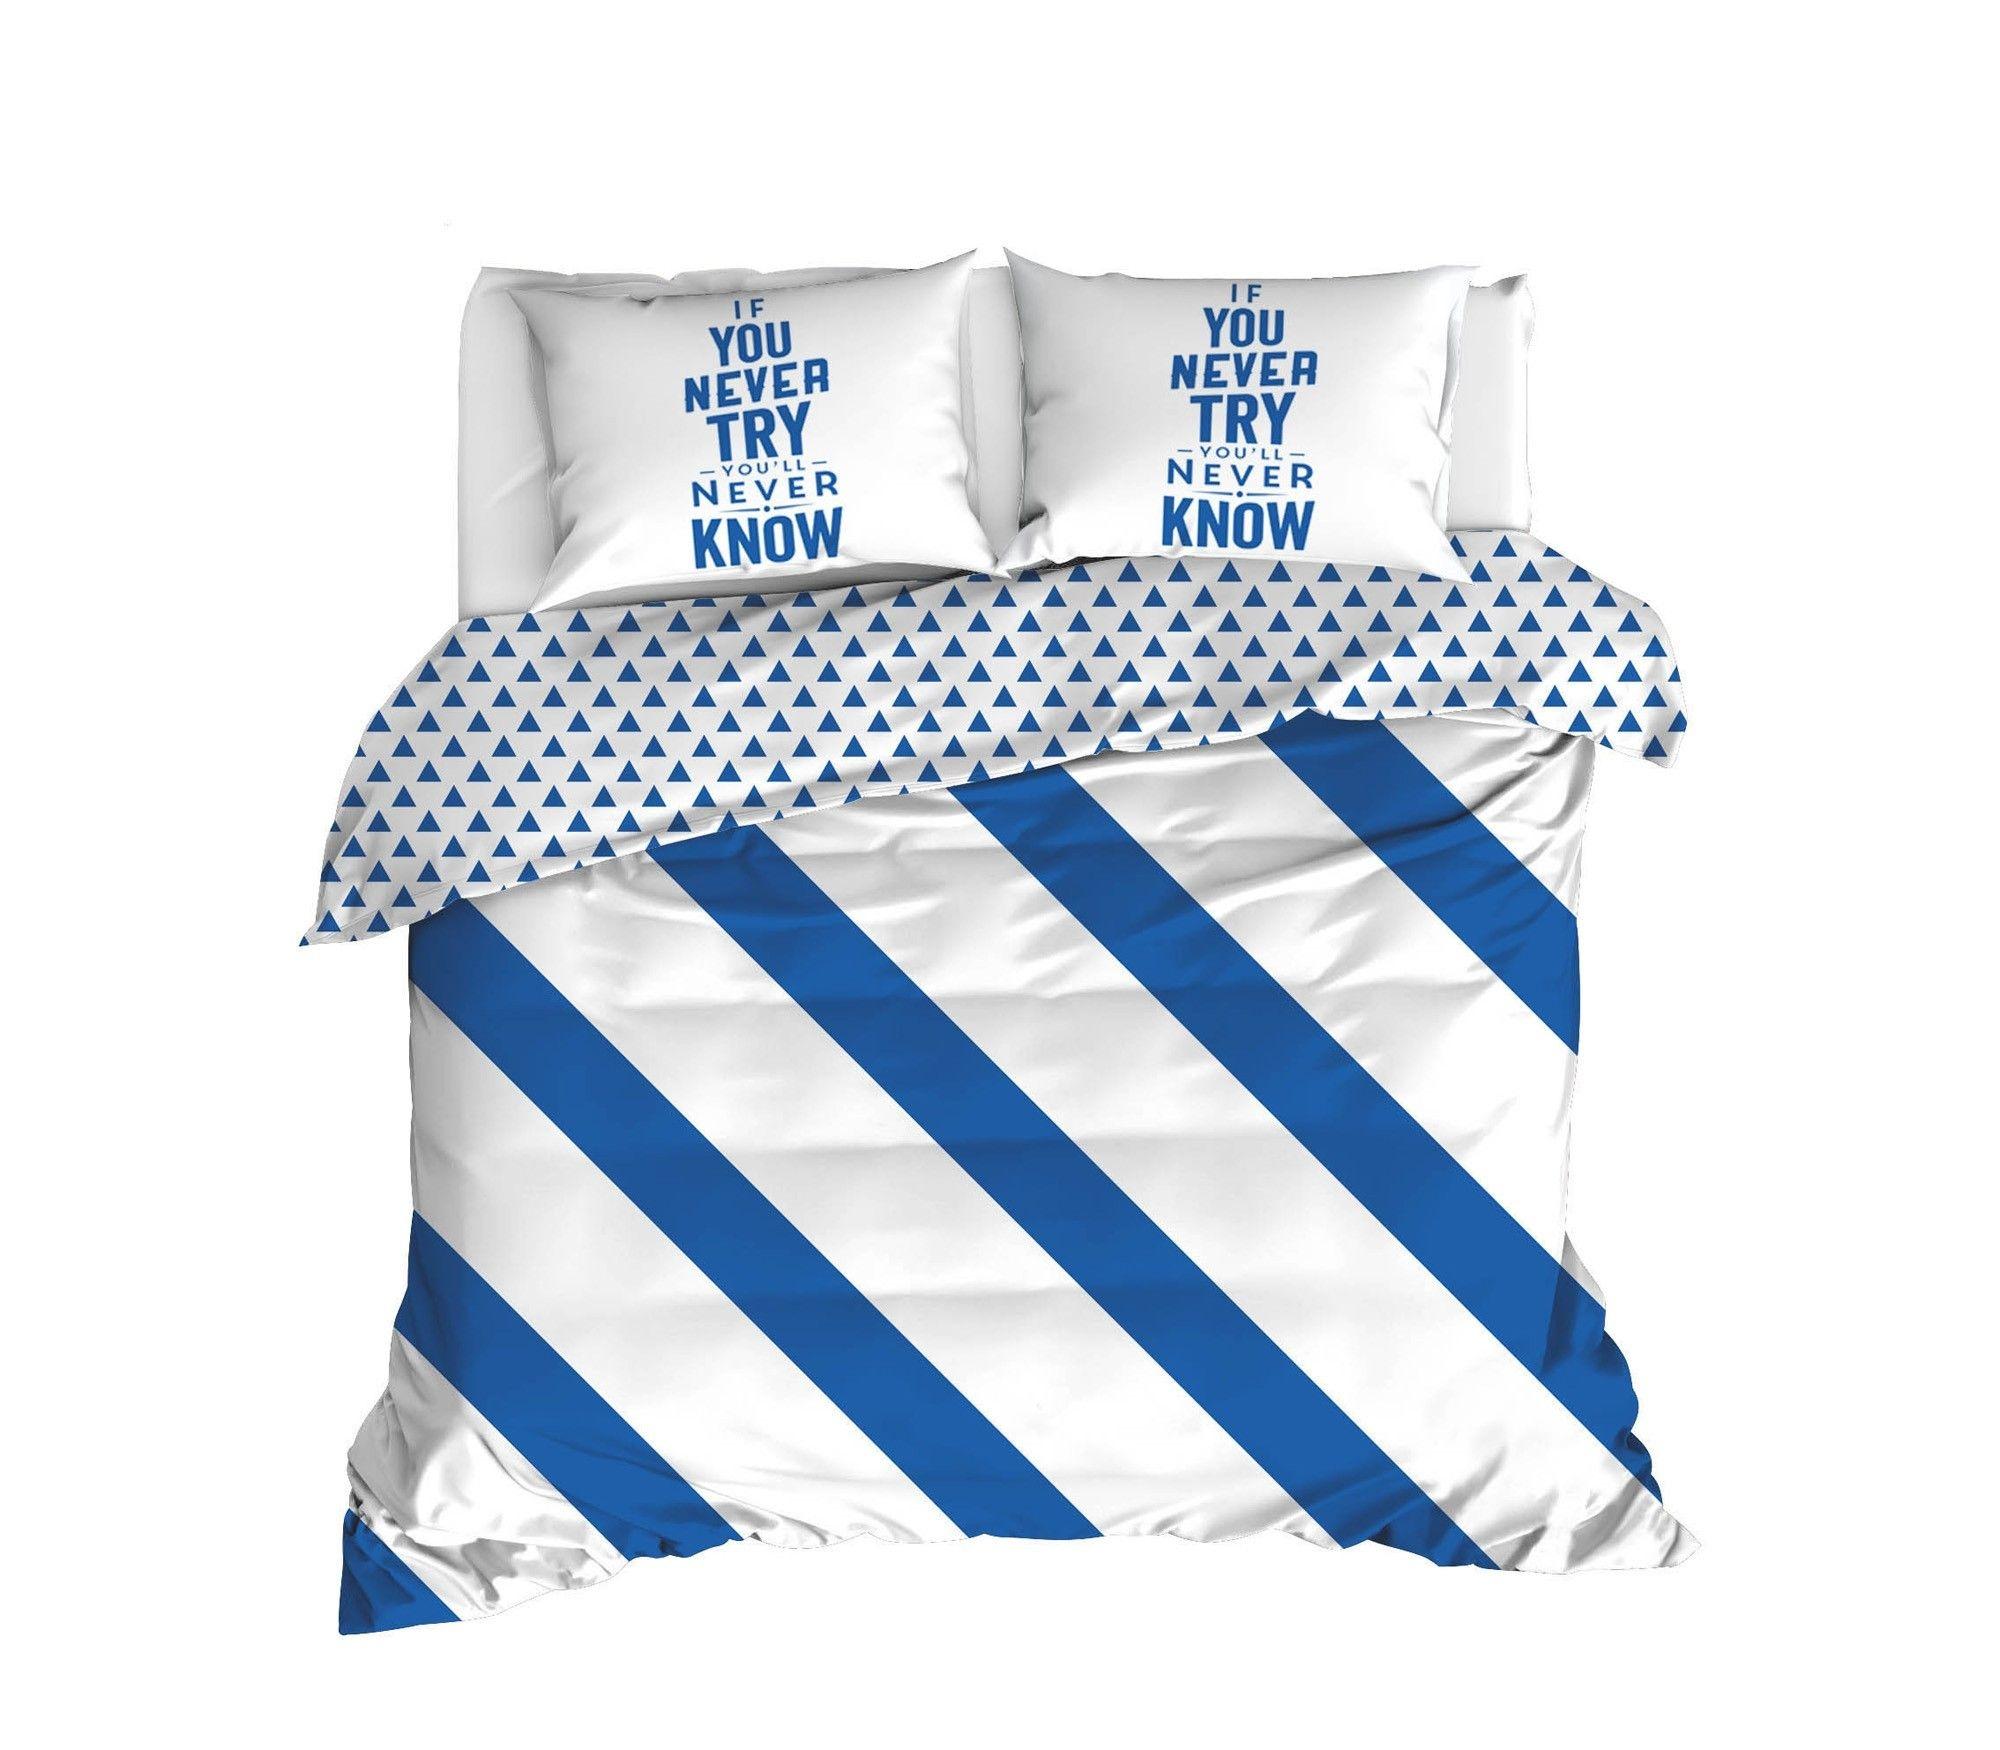 Lenjerie de pat din bumbac Ranforce, Erona Alb / Albastru, 200 x 220 cm imagine